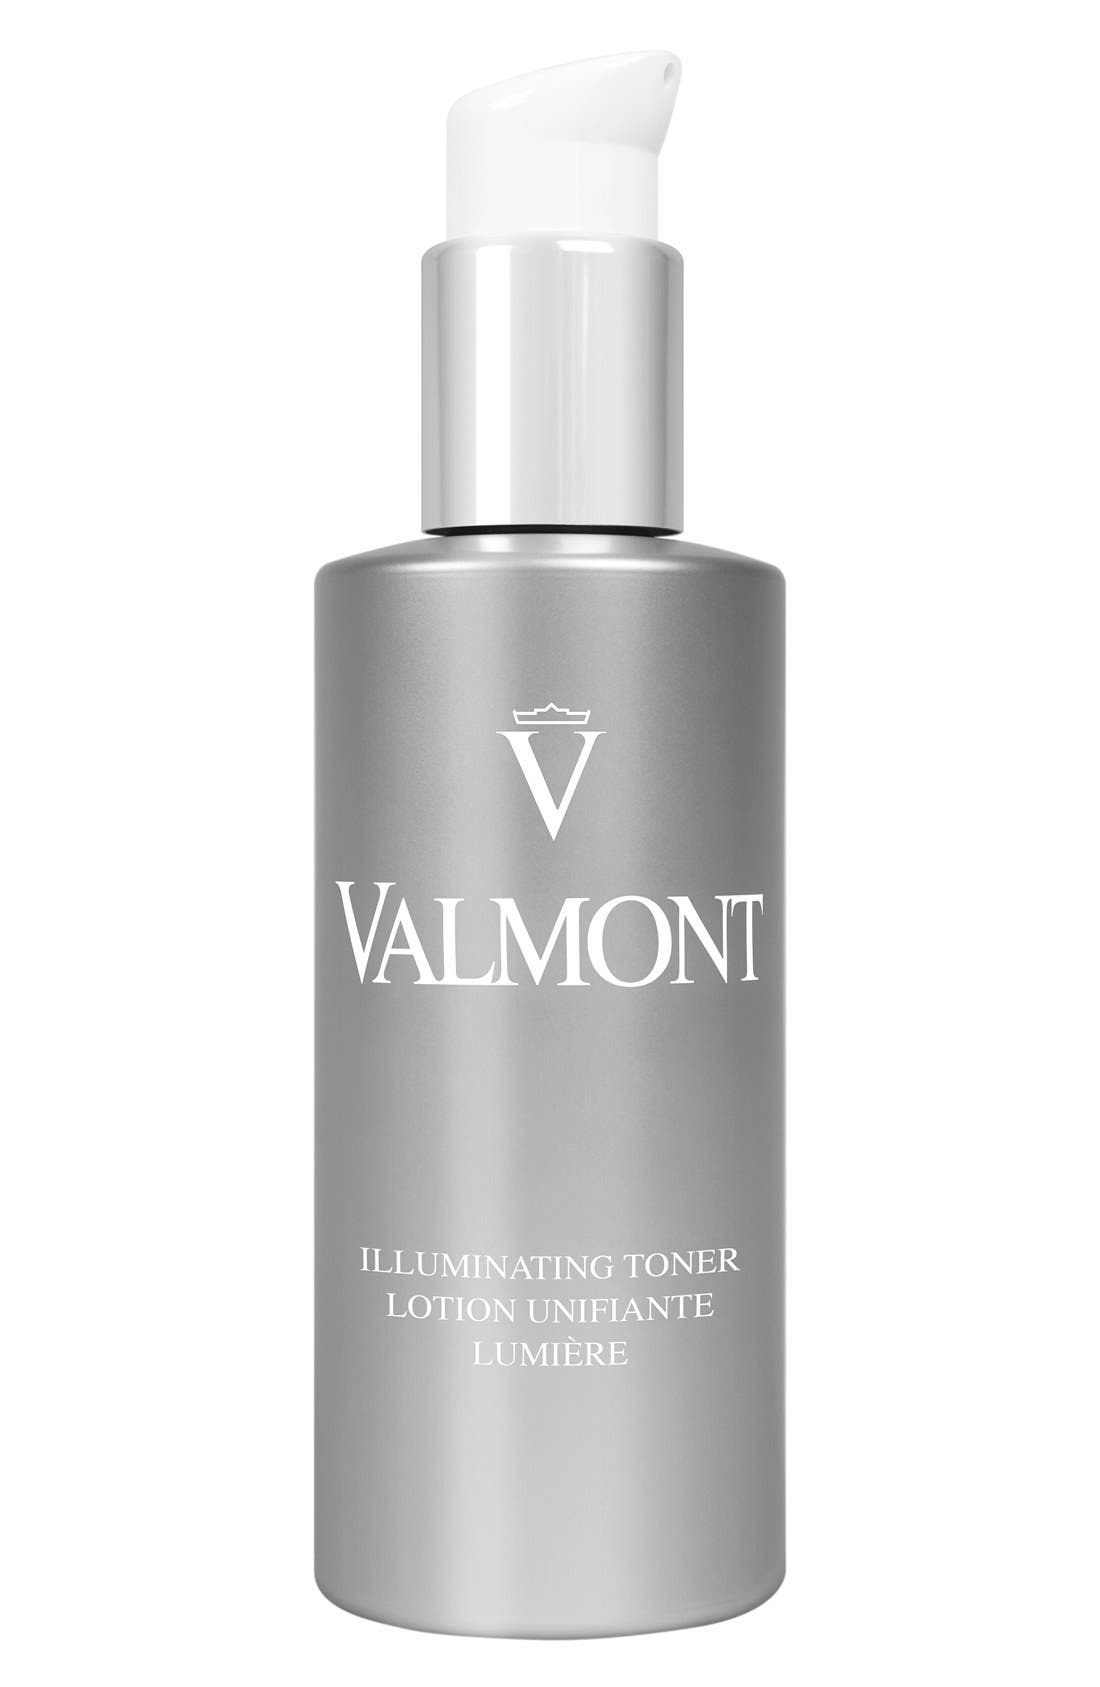 Valmont Illuminating Toner Lotion